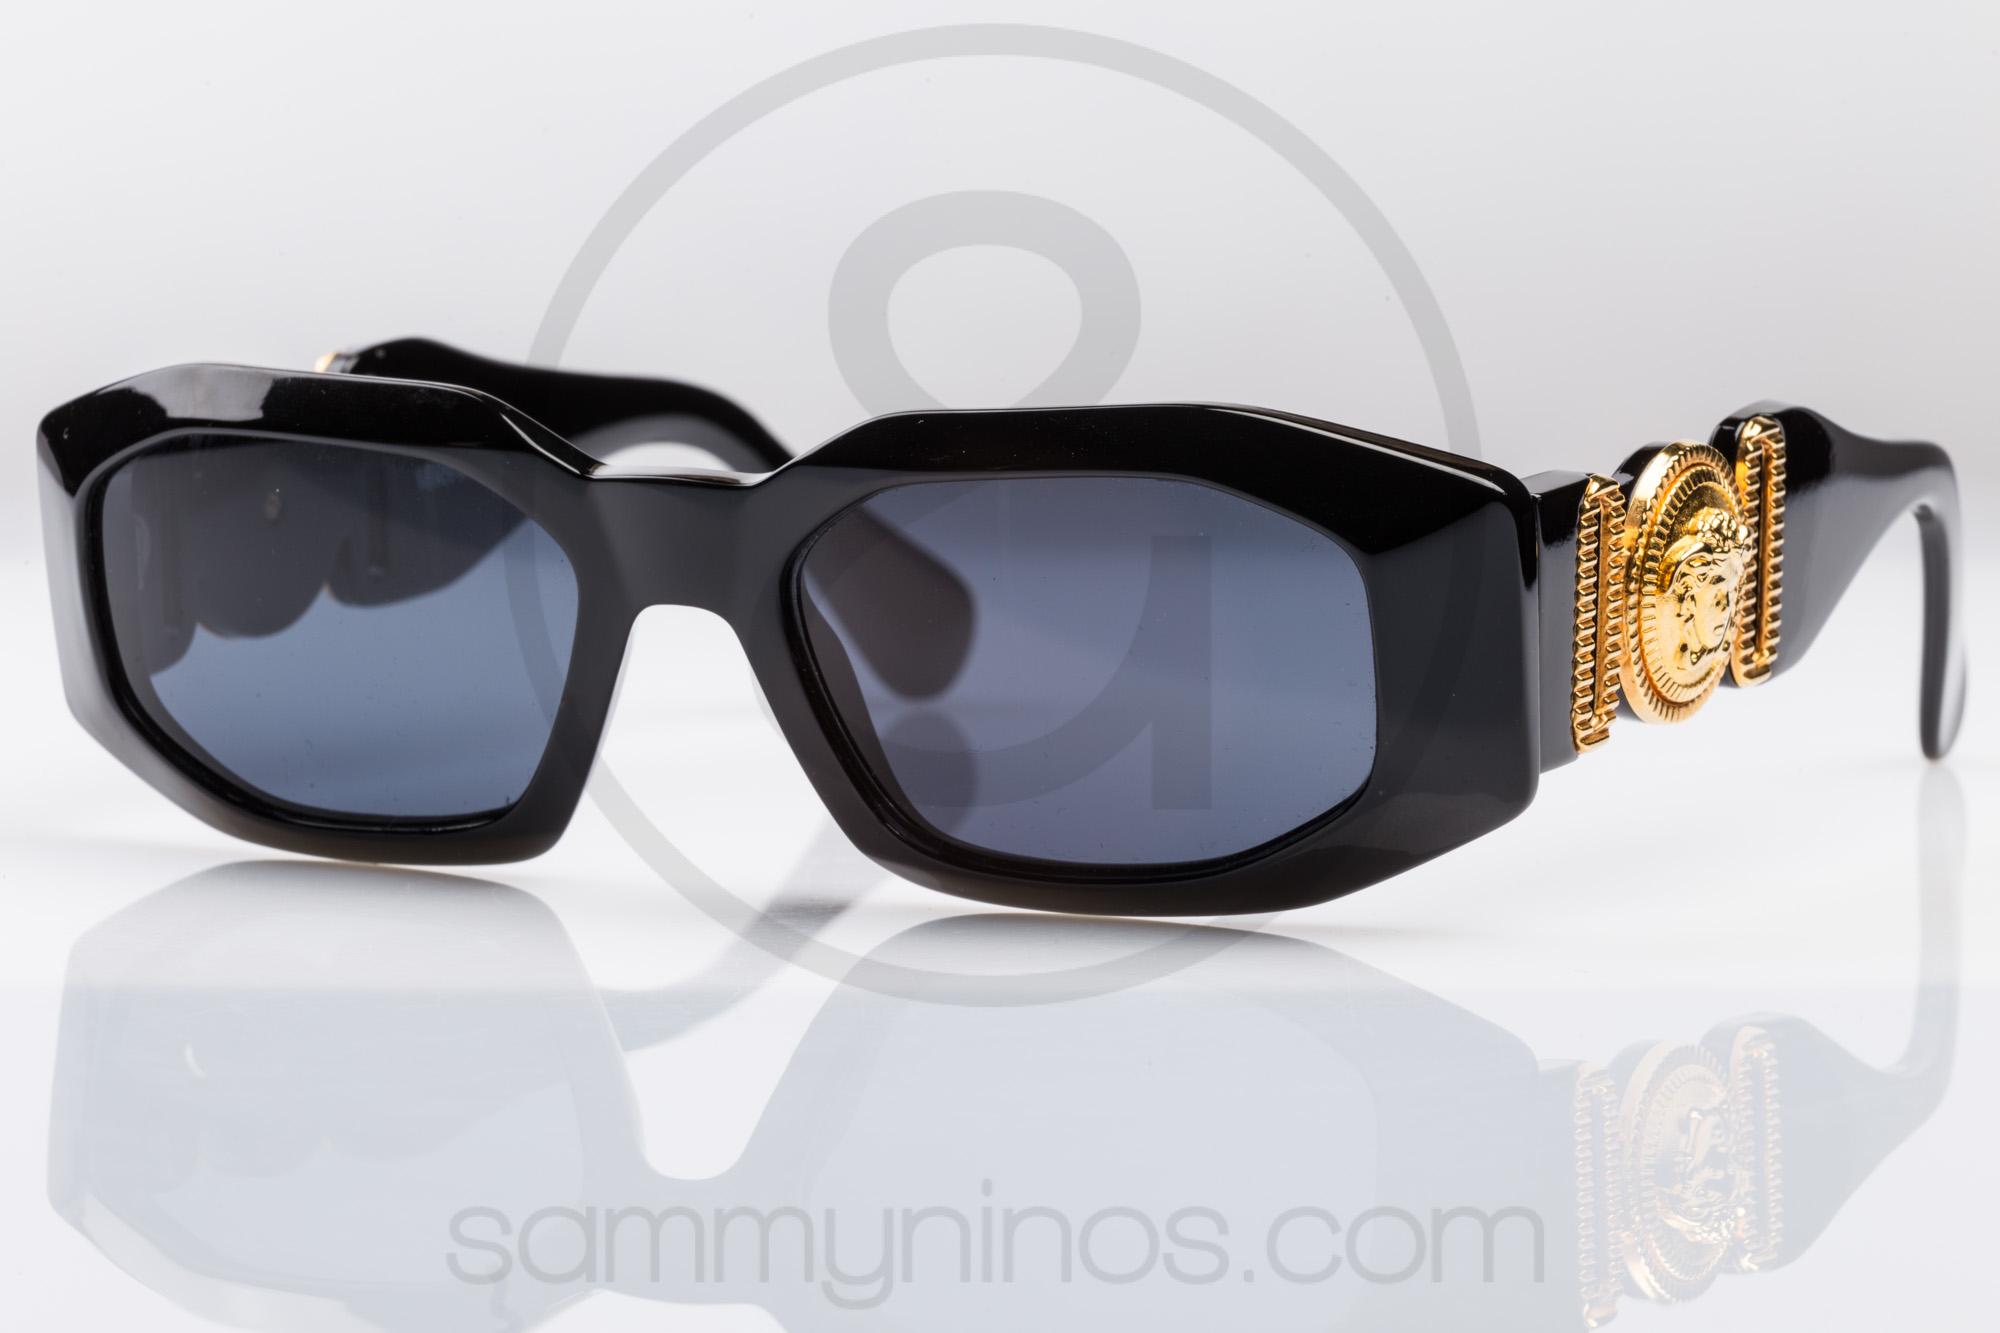 769b401dcf9c Gianni Versace 414/a 852 – Sammy & Nino's Store